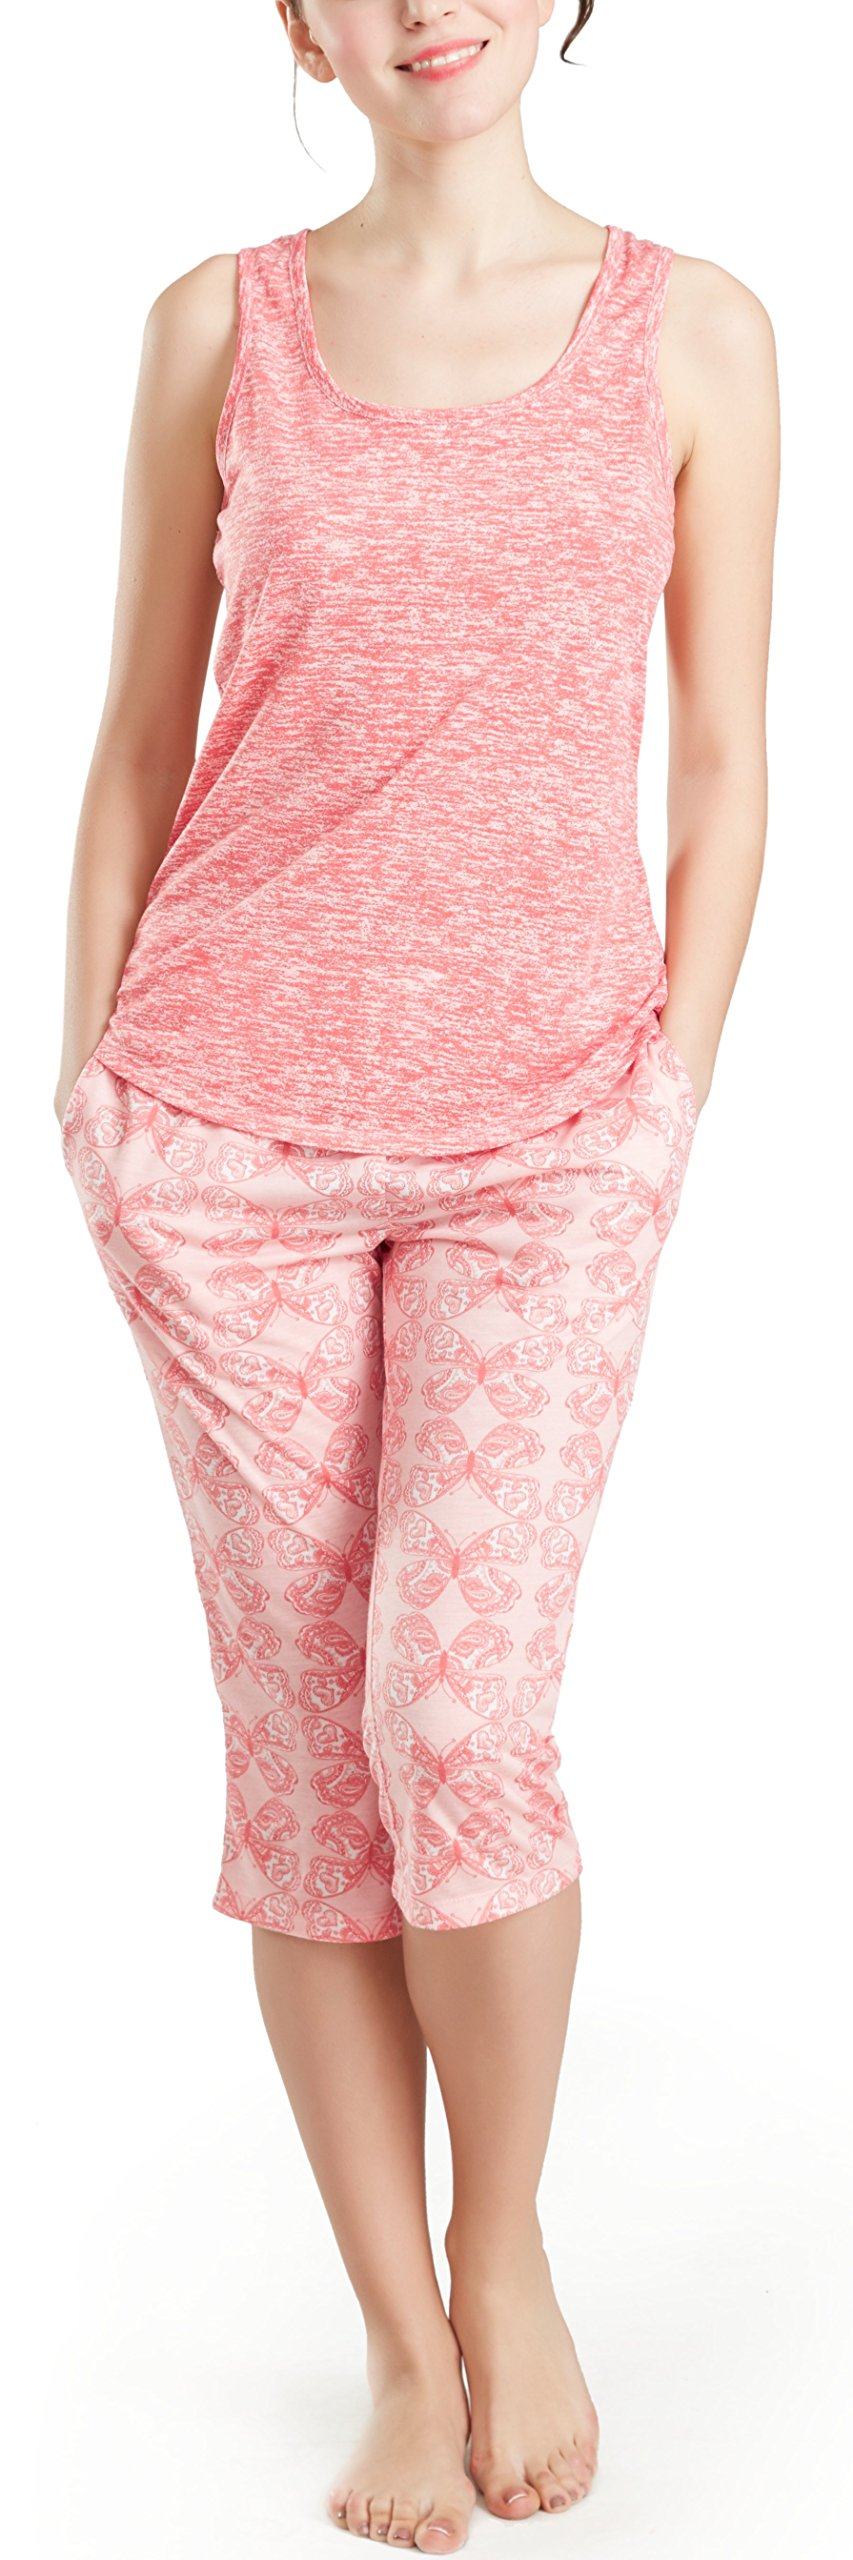 Summer Pajamas for Women, Cute Print Capris Pajama for Woman - Pjs Women Jersey Tank Top and Capri Jogger Pants Set Butterfly XXL